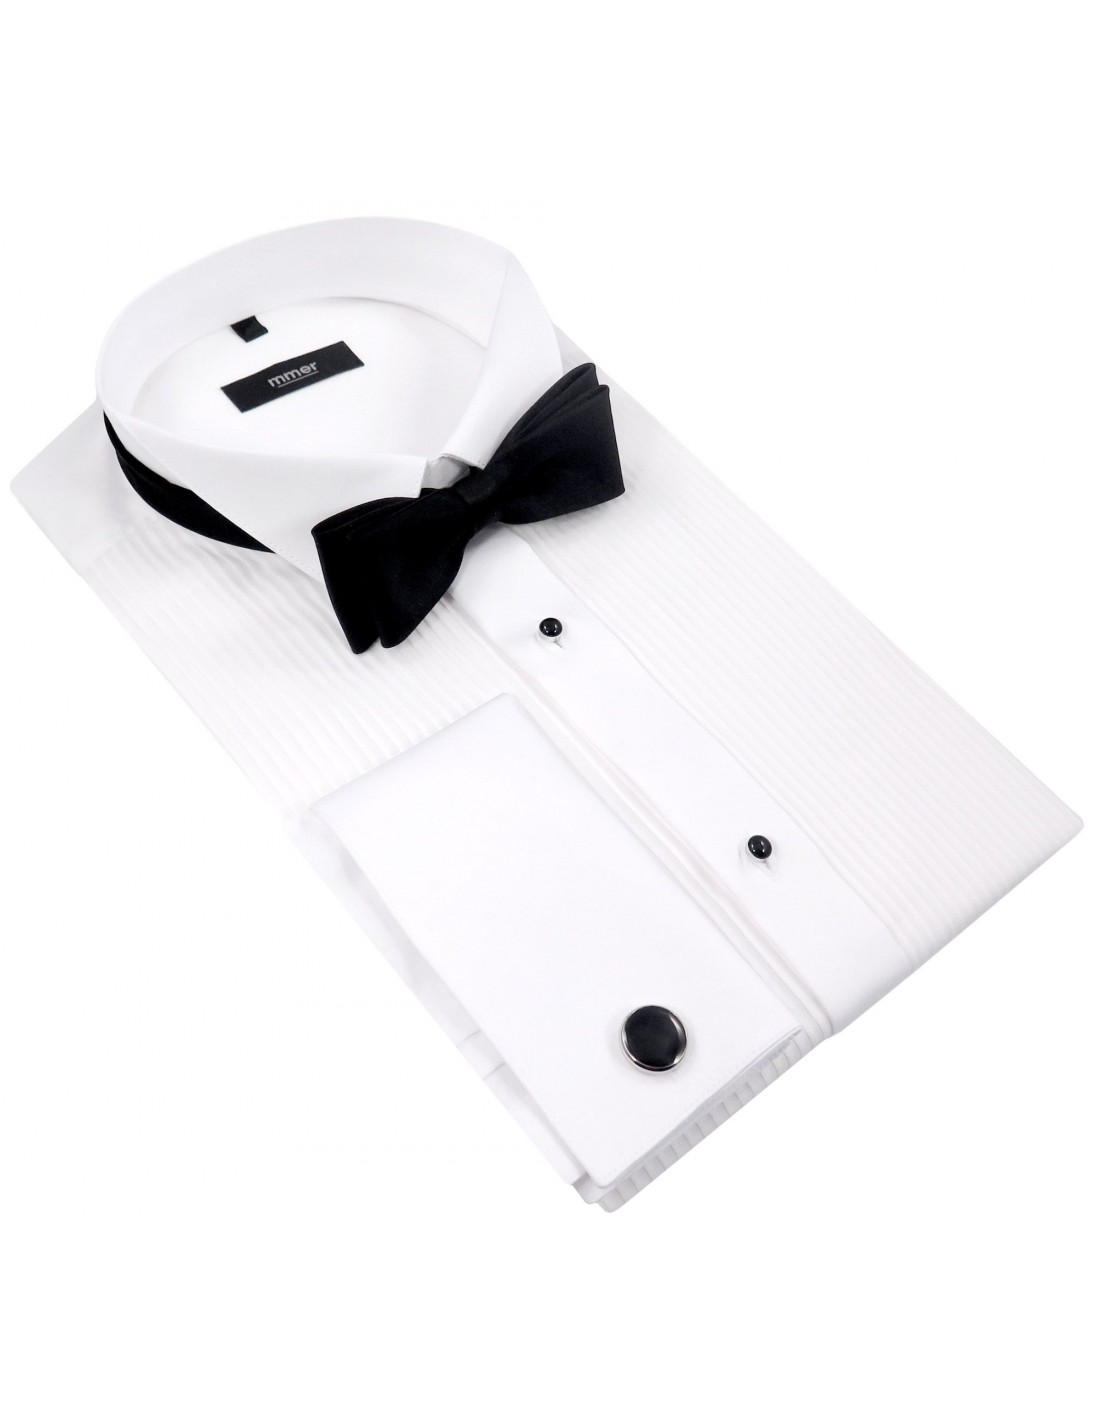 07c74e065d70 Biała koszula smokingowa z plisami Mmer 100 M3